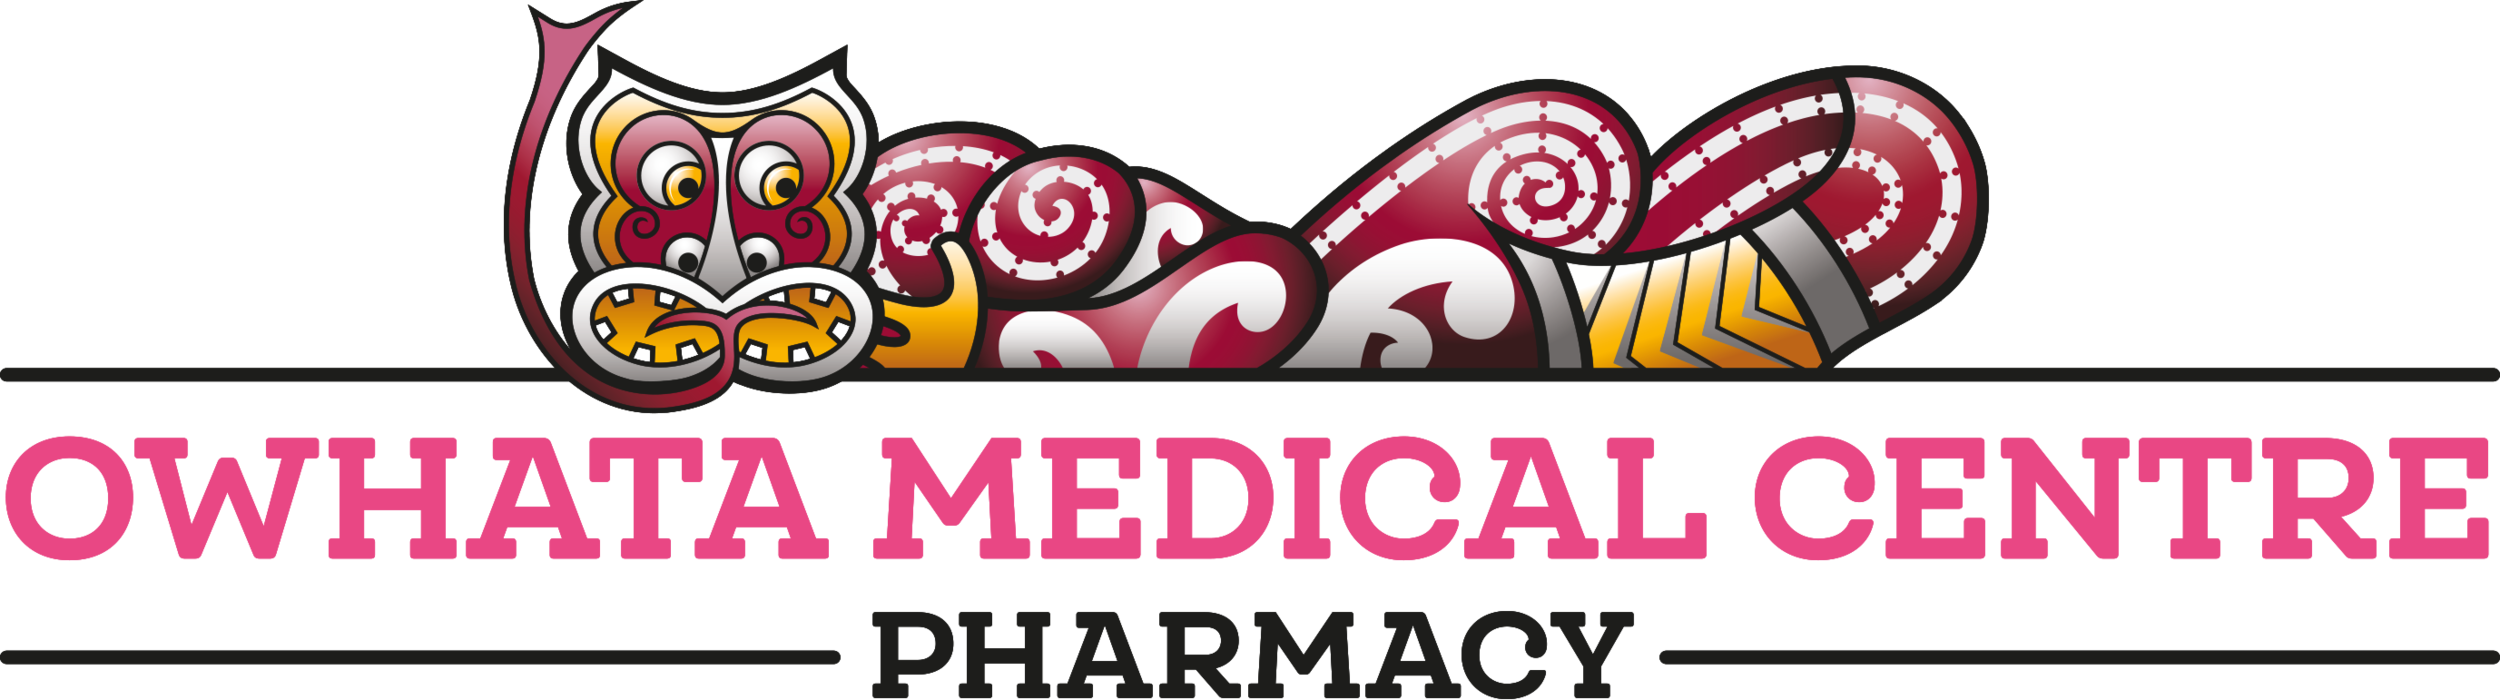 Owhata_MC_logo.png